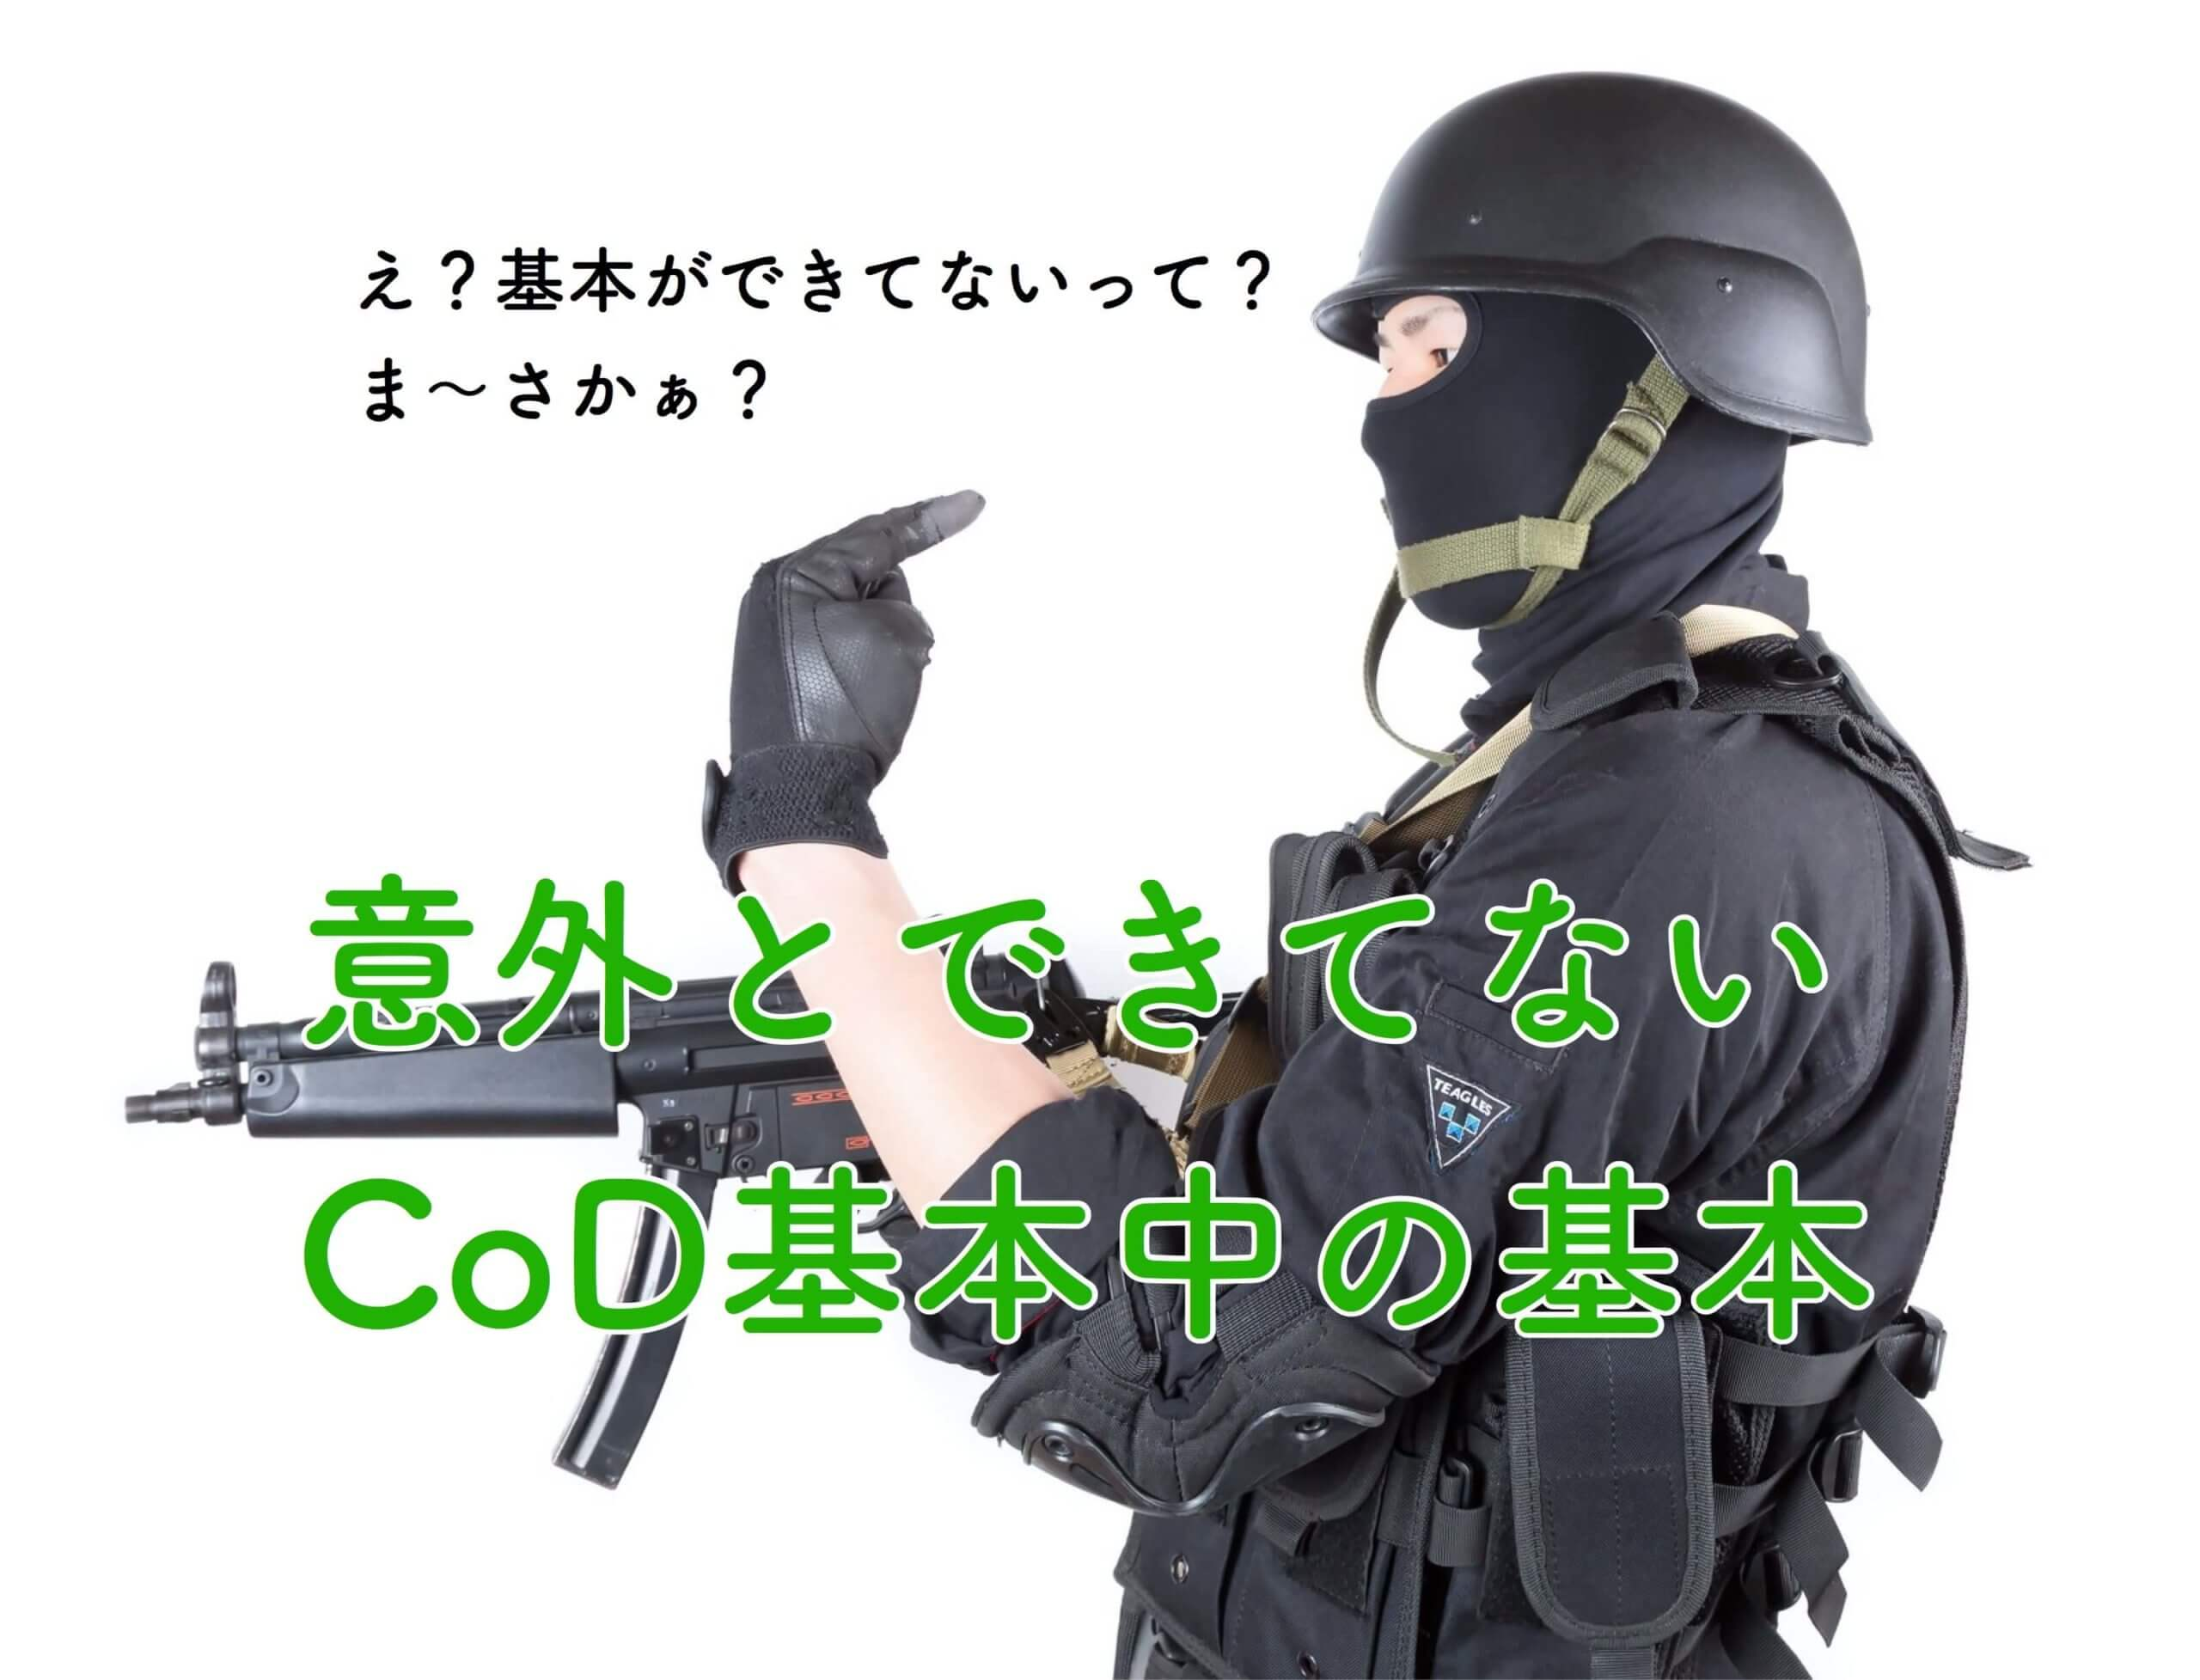 CoDの基本